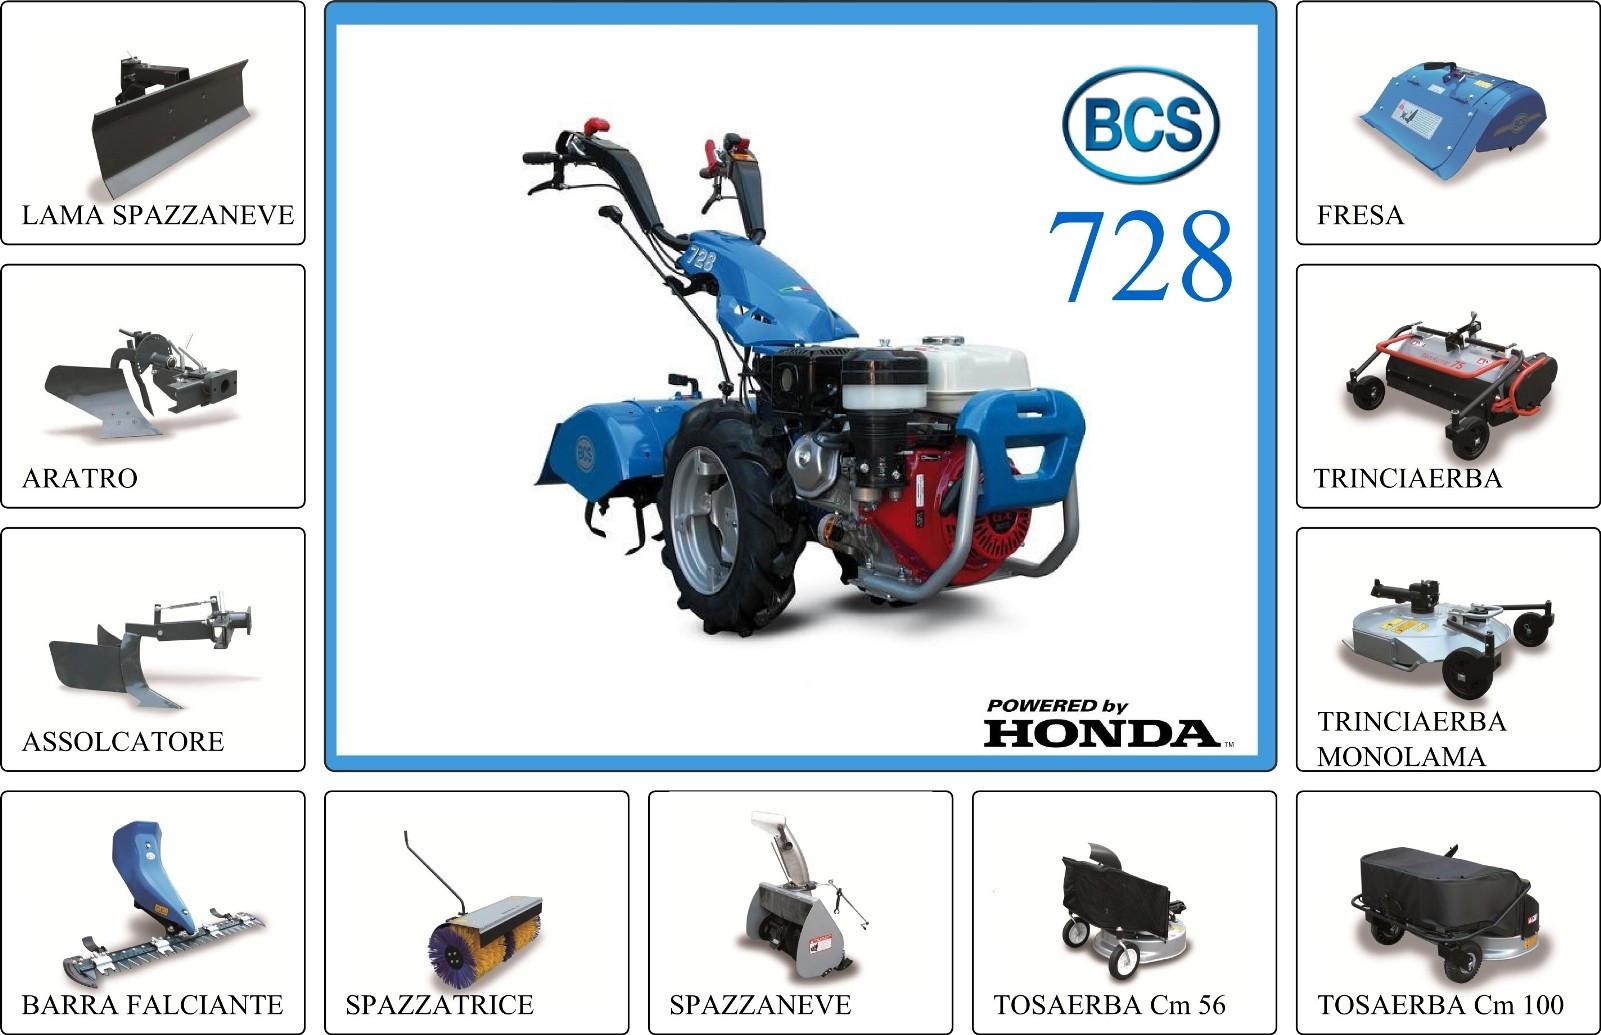 Motokultivator bcs 728 powersafe for Motocoltivatore bcs 720